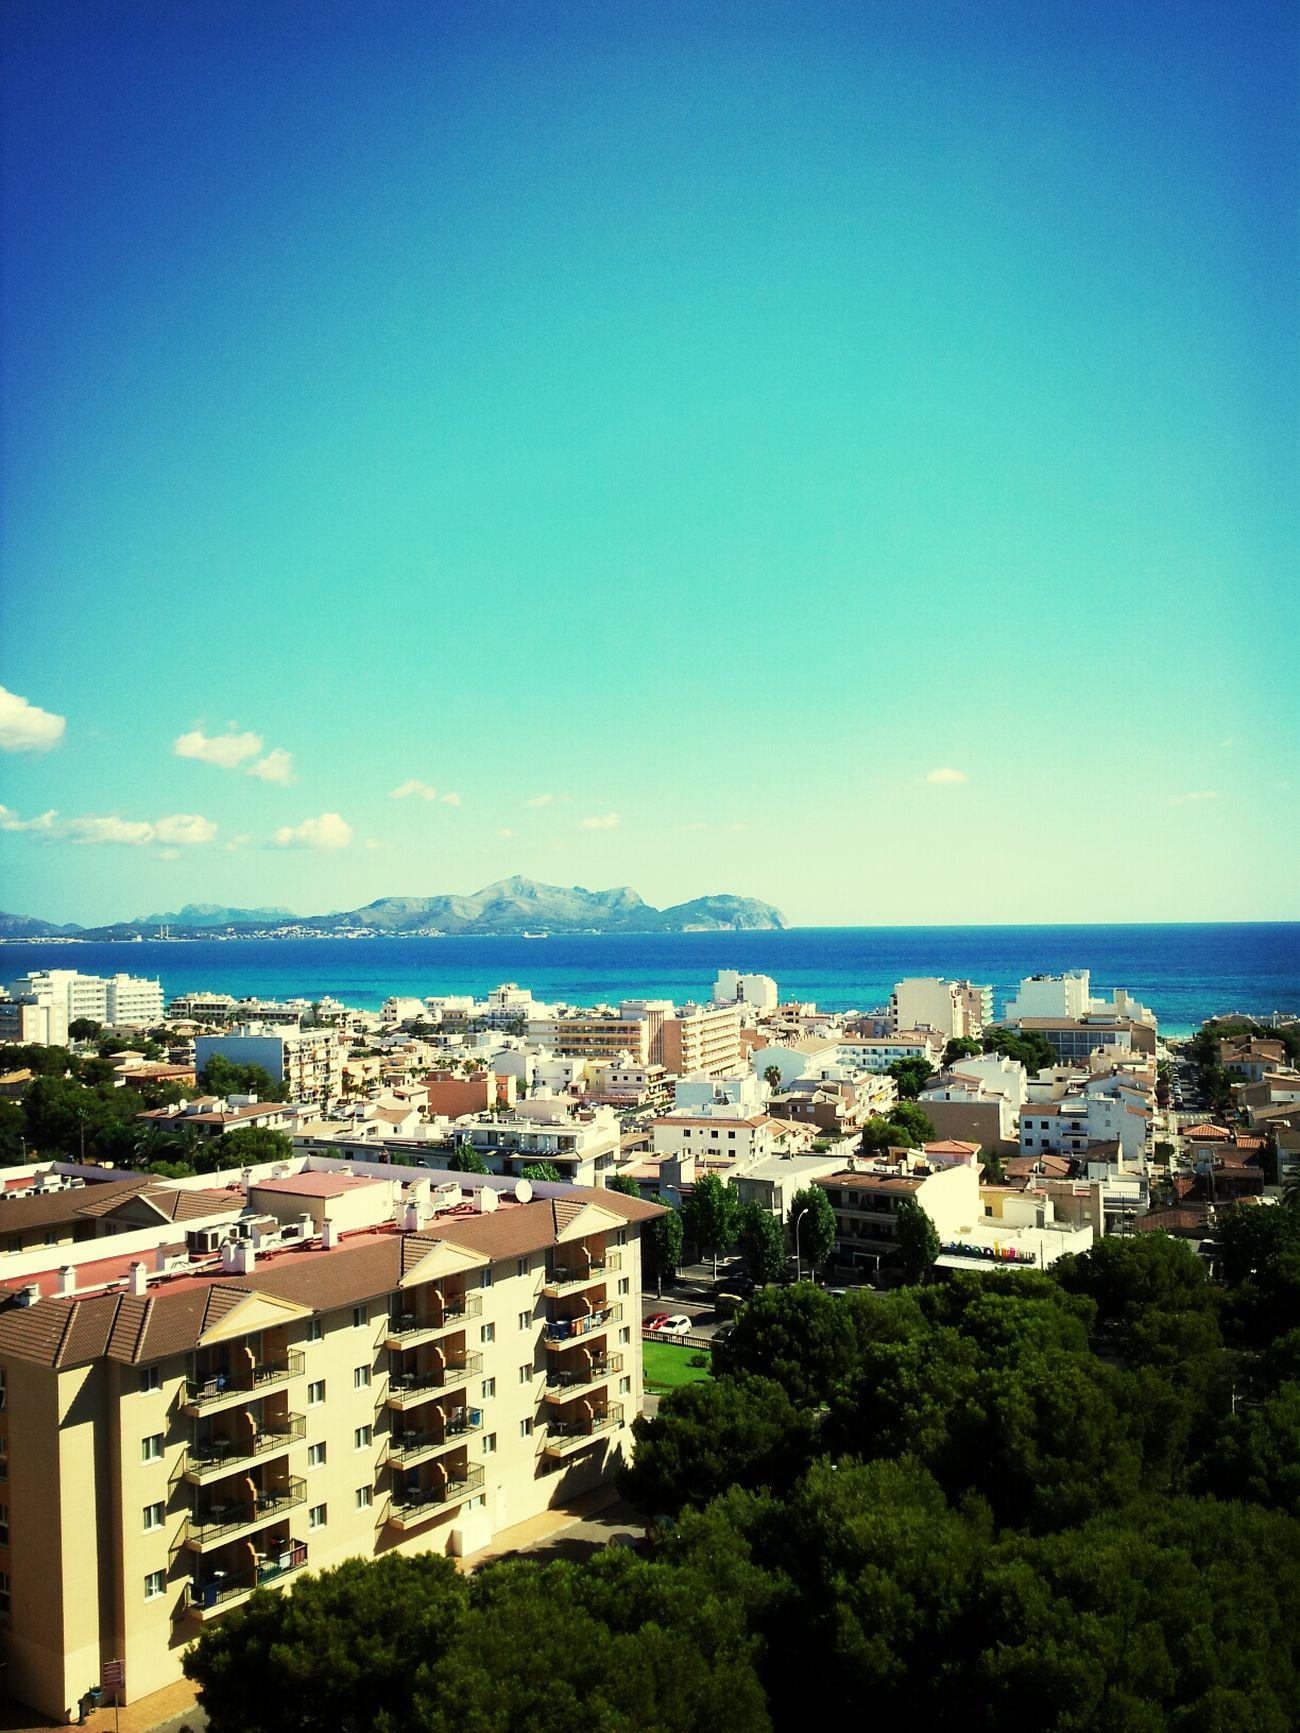 Vocation Summer 2013 Mallorca Meer